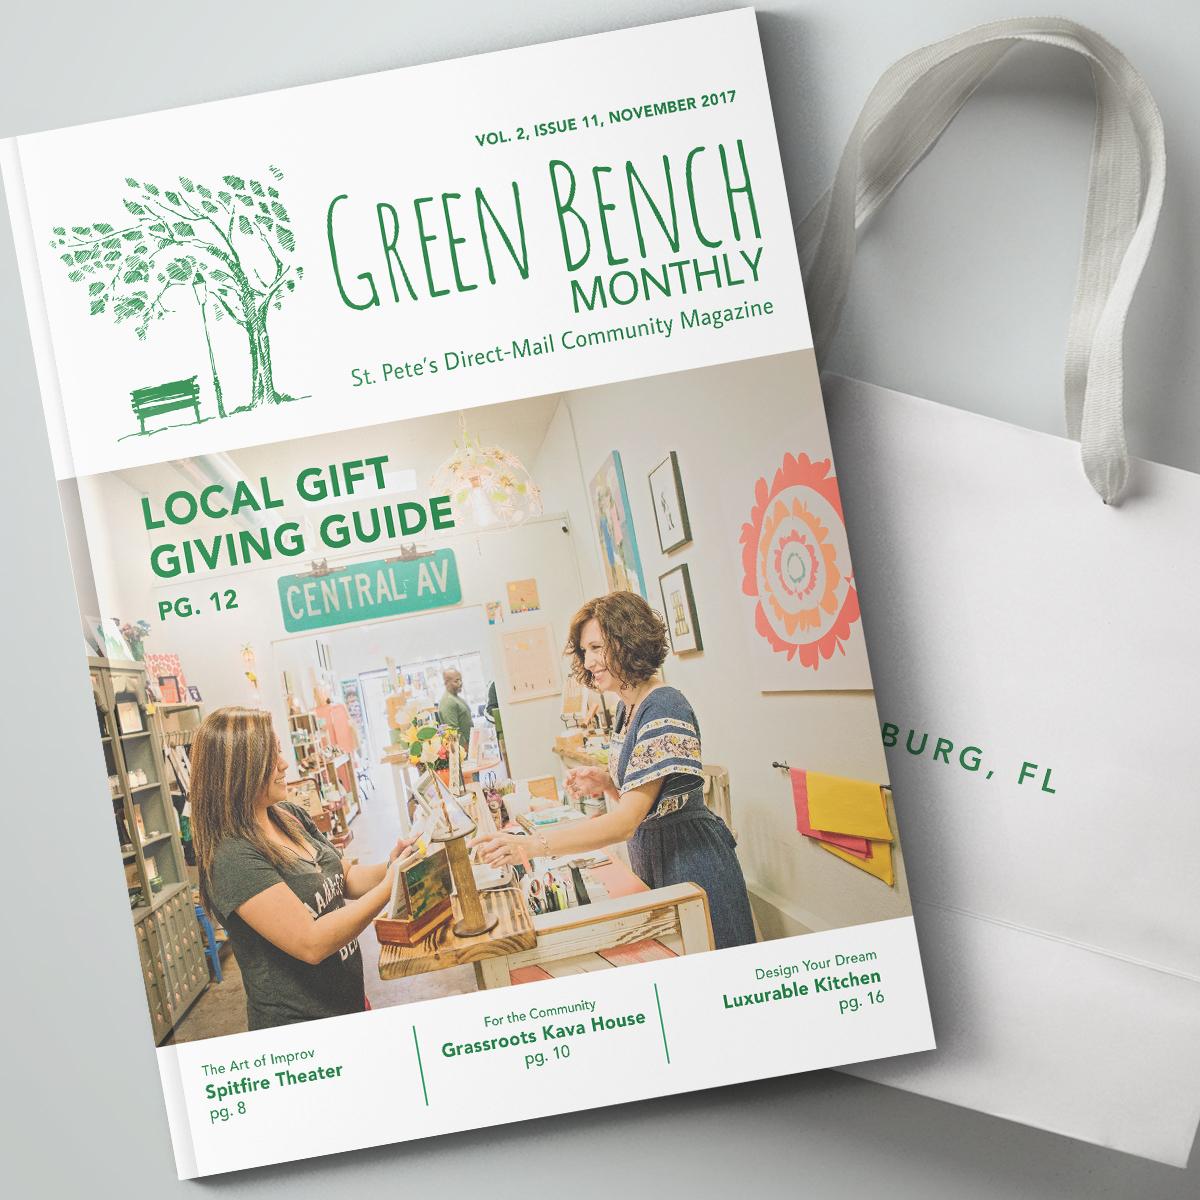 Vol. 2, Issue 11, November 2017